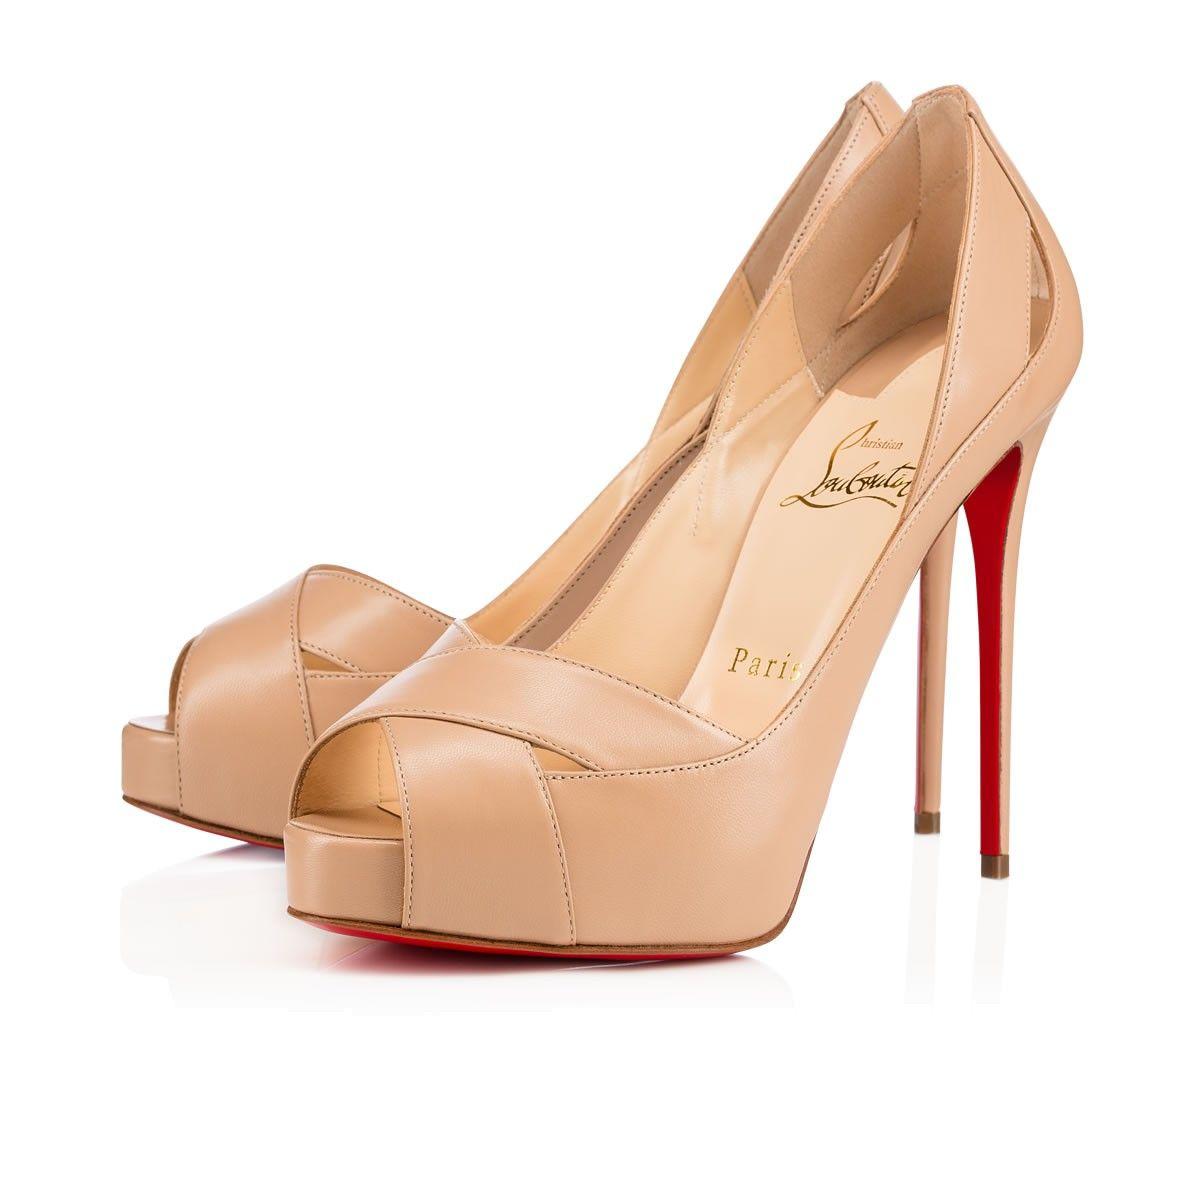 3943f3139223 Shoes - Academa - Christian Louboutin. CHRISTIAN LOUBOUTIN Academa 120Mm Nude  Leather.